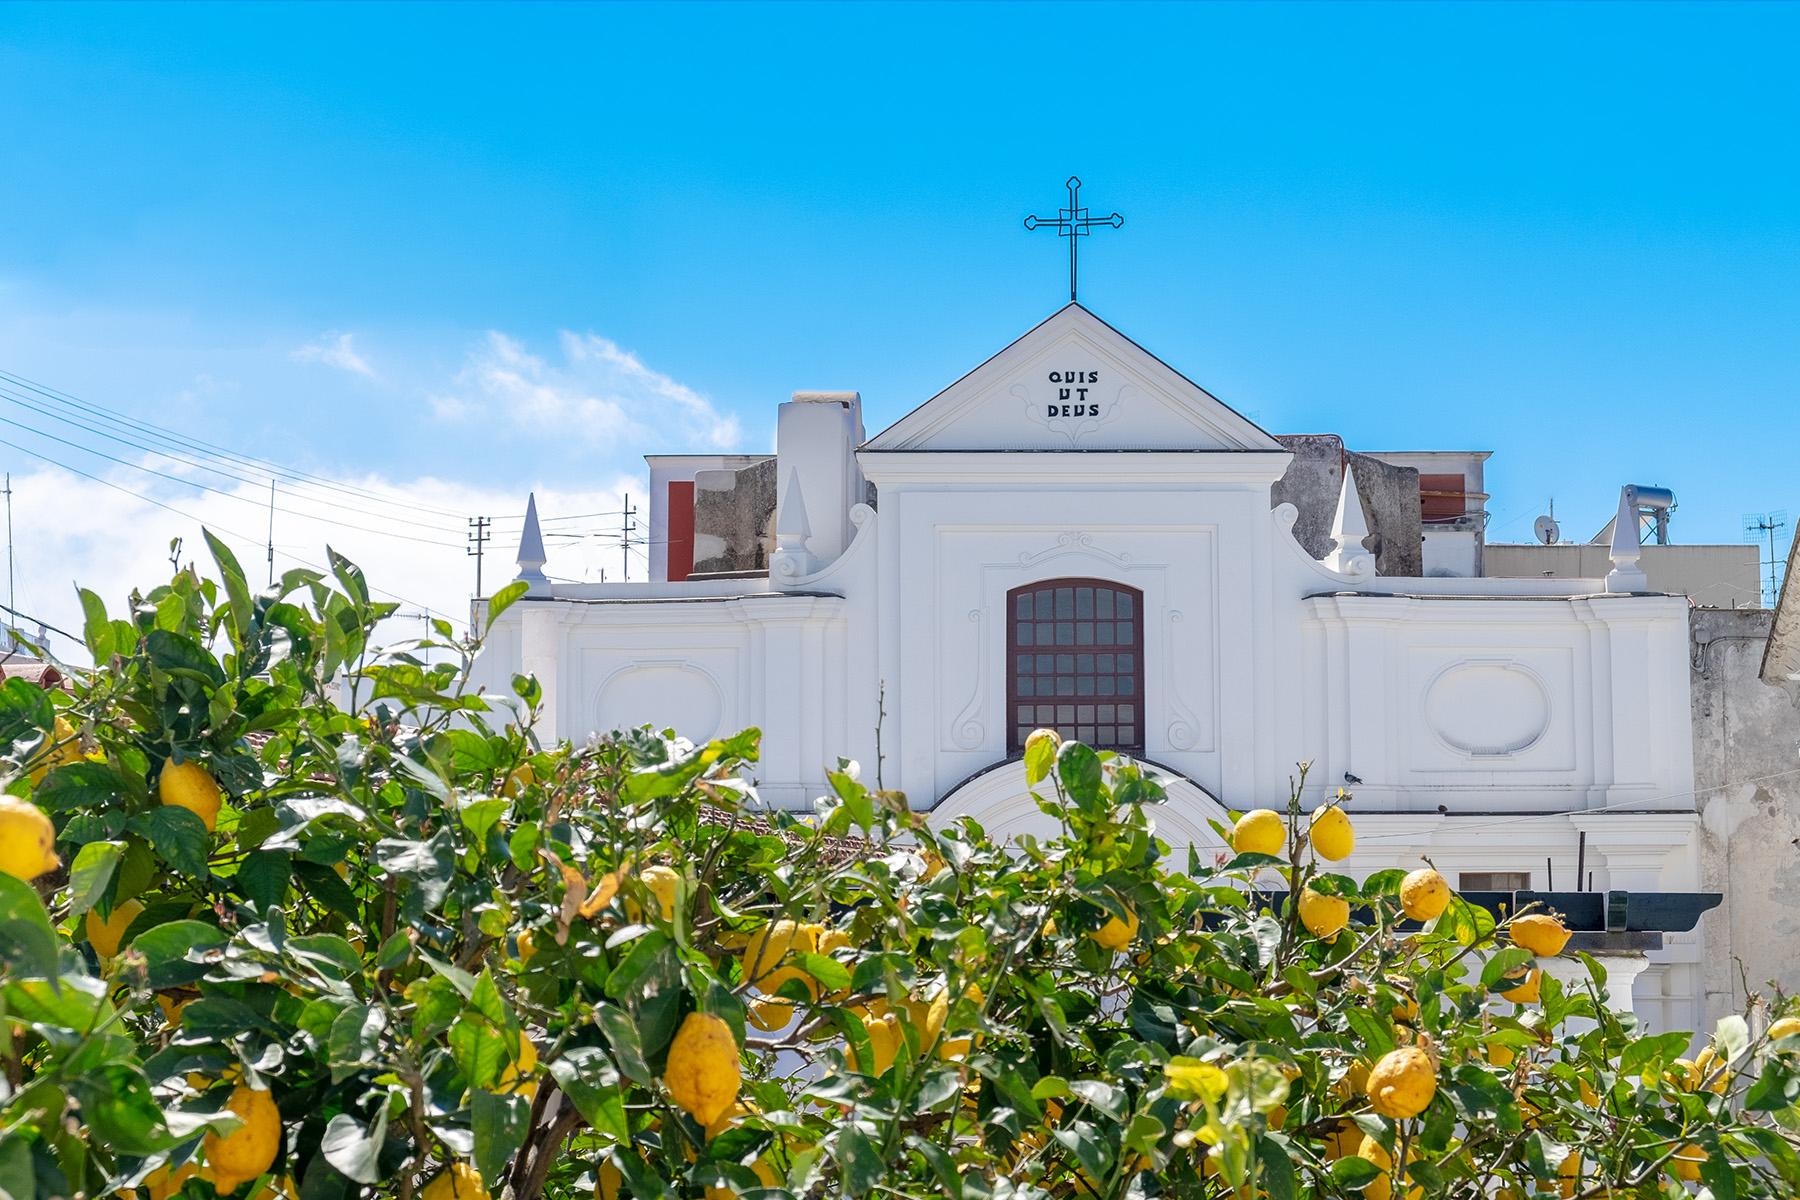 Casa indipendente in Vendita a Capri: 5 locali, 300 mq - Foto 27